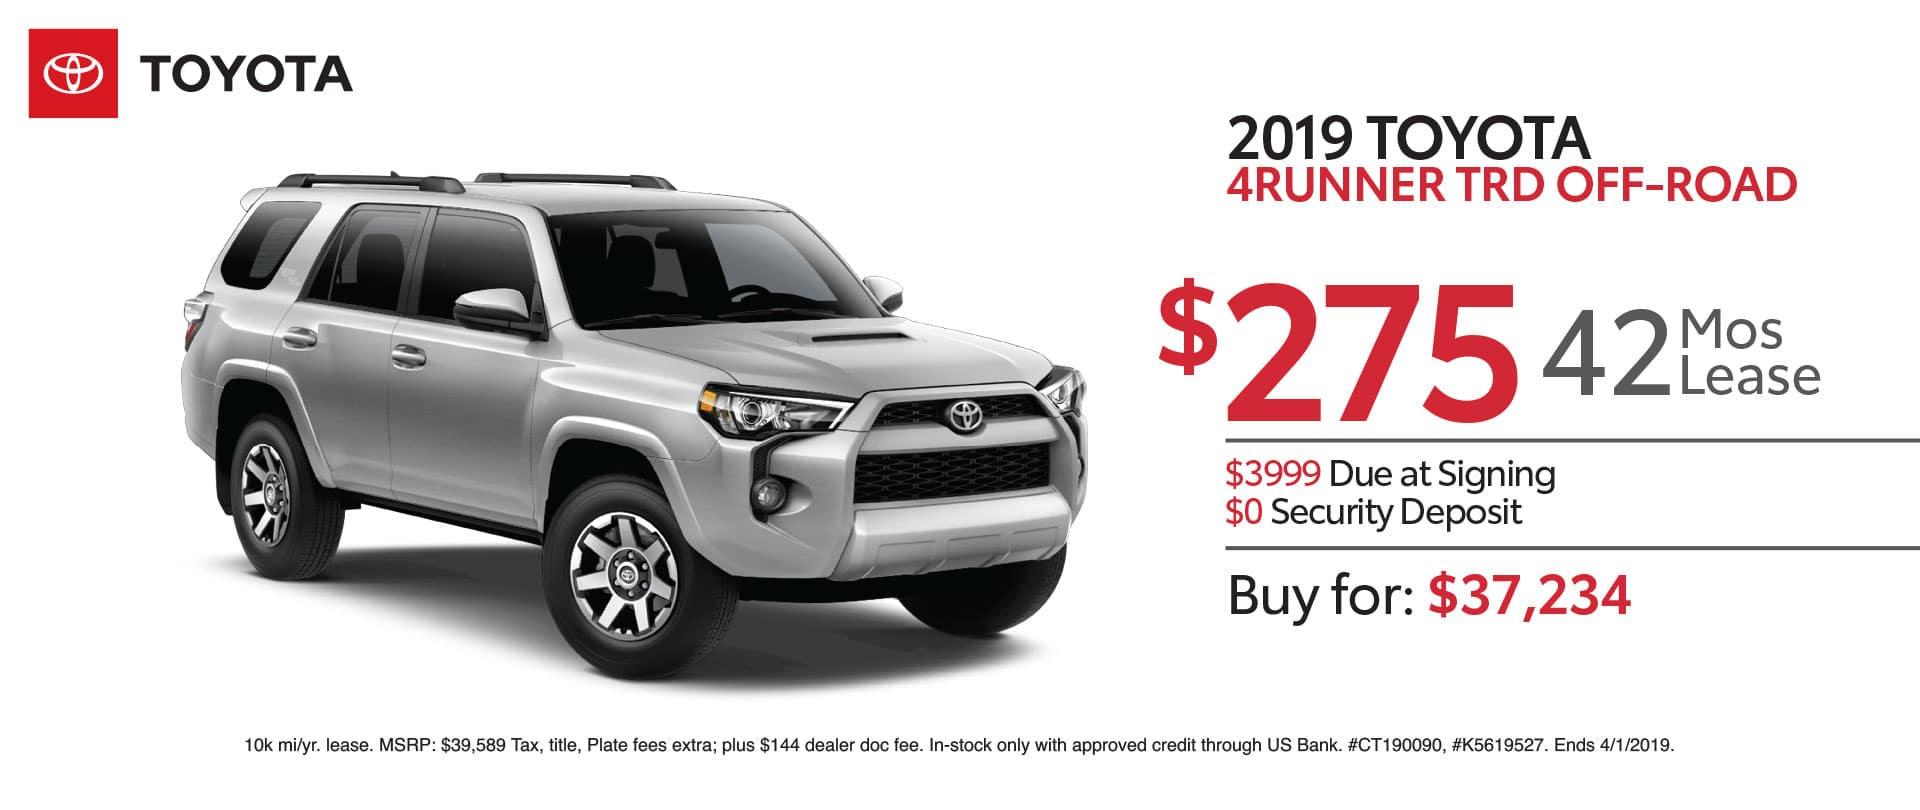 2019 Toyota